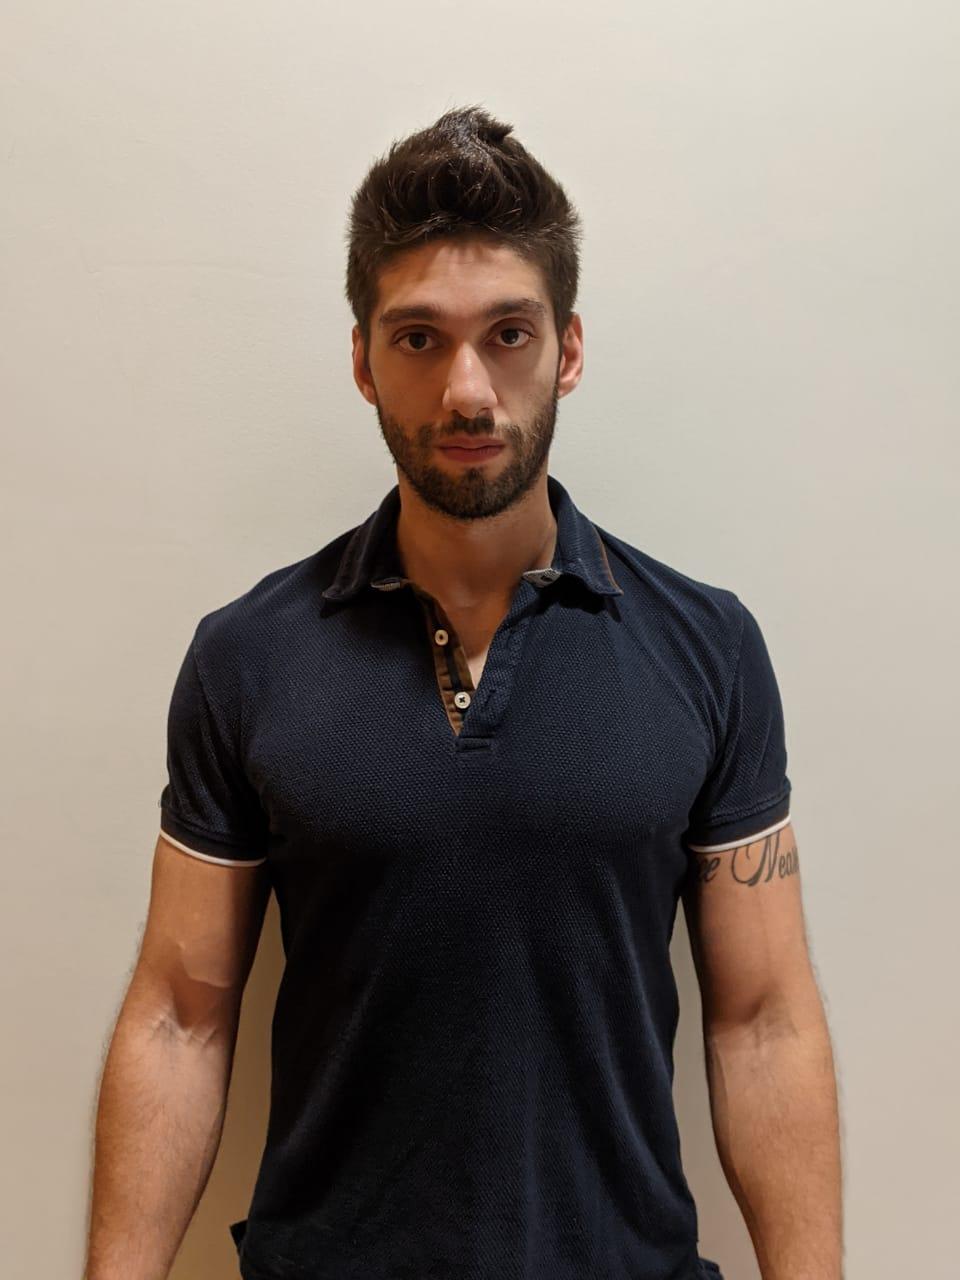 Santiago Racca